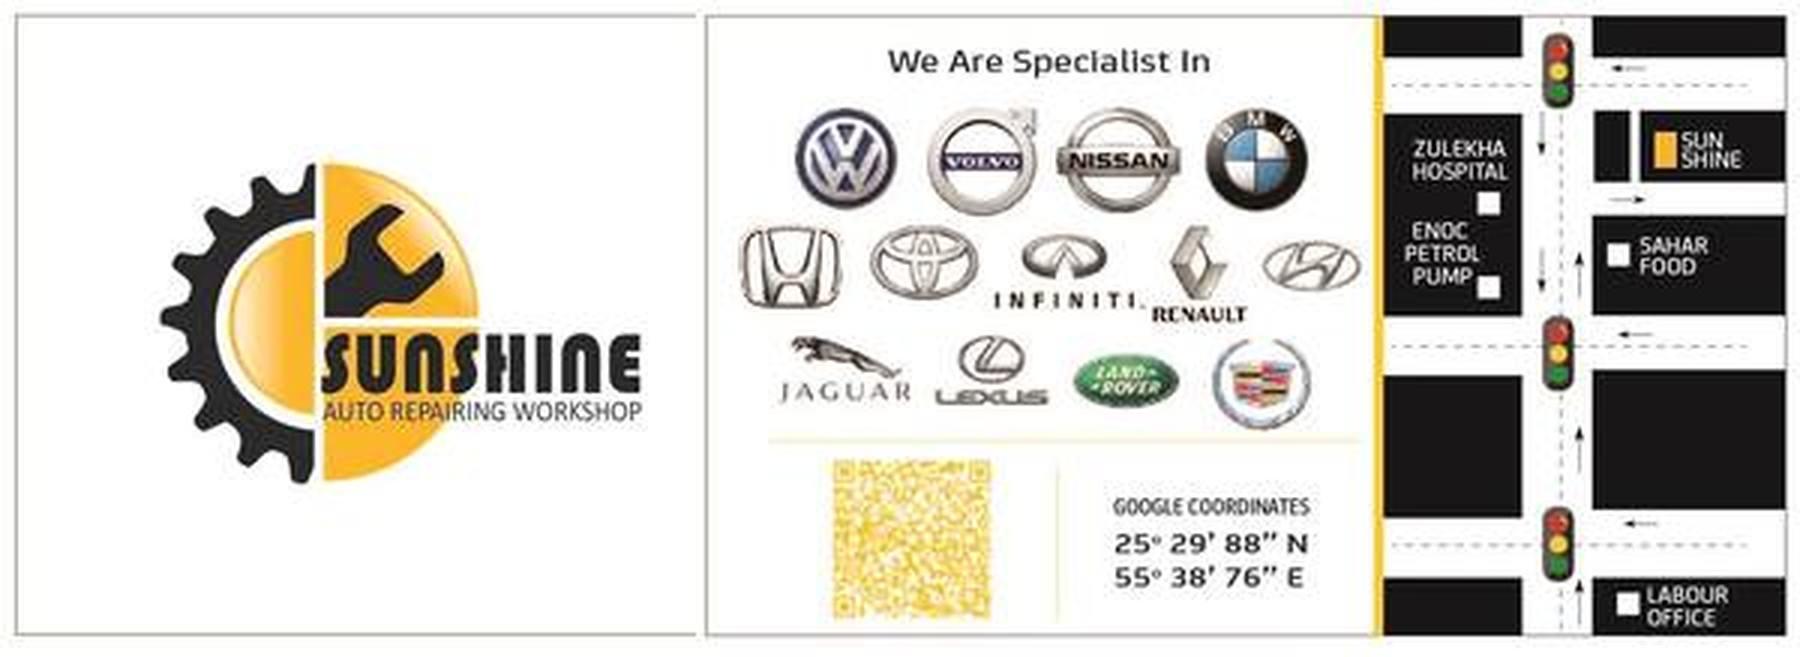 Car Repair & Service Workshop Sunshine Auto Repair Supplier in